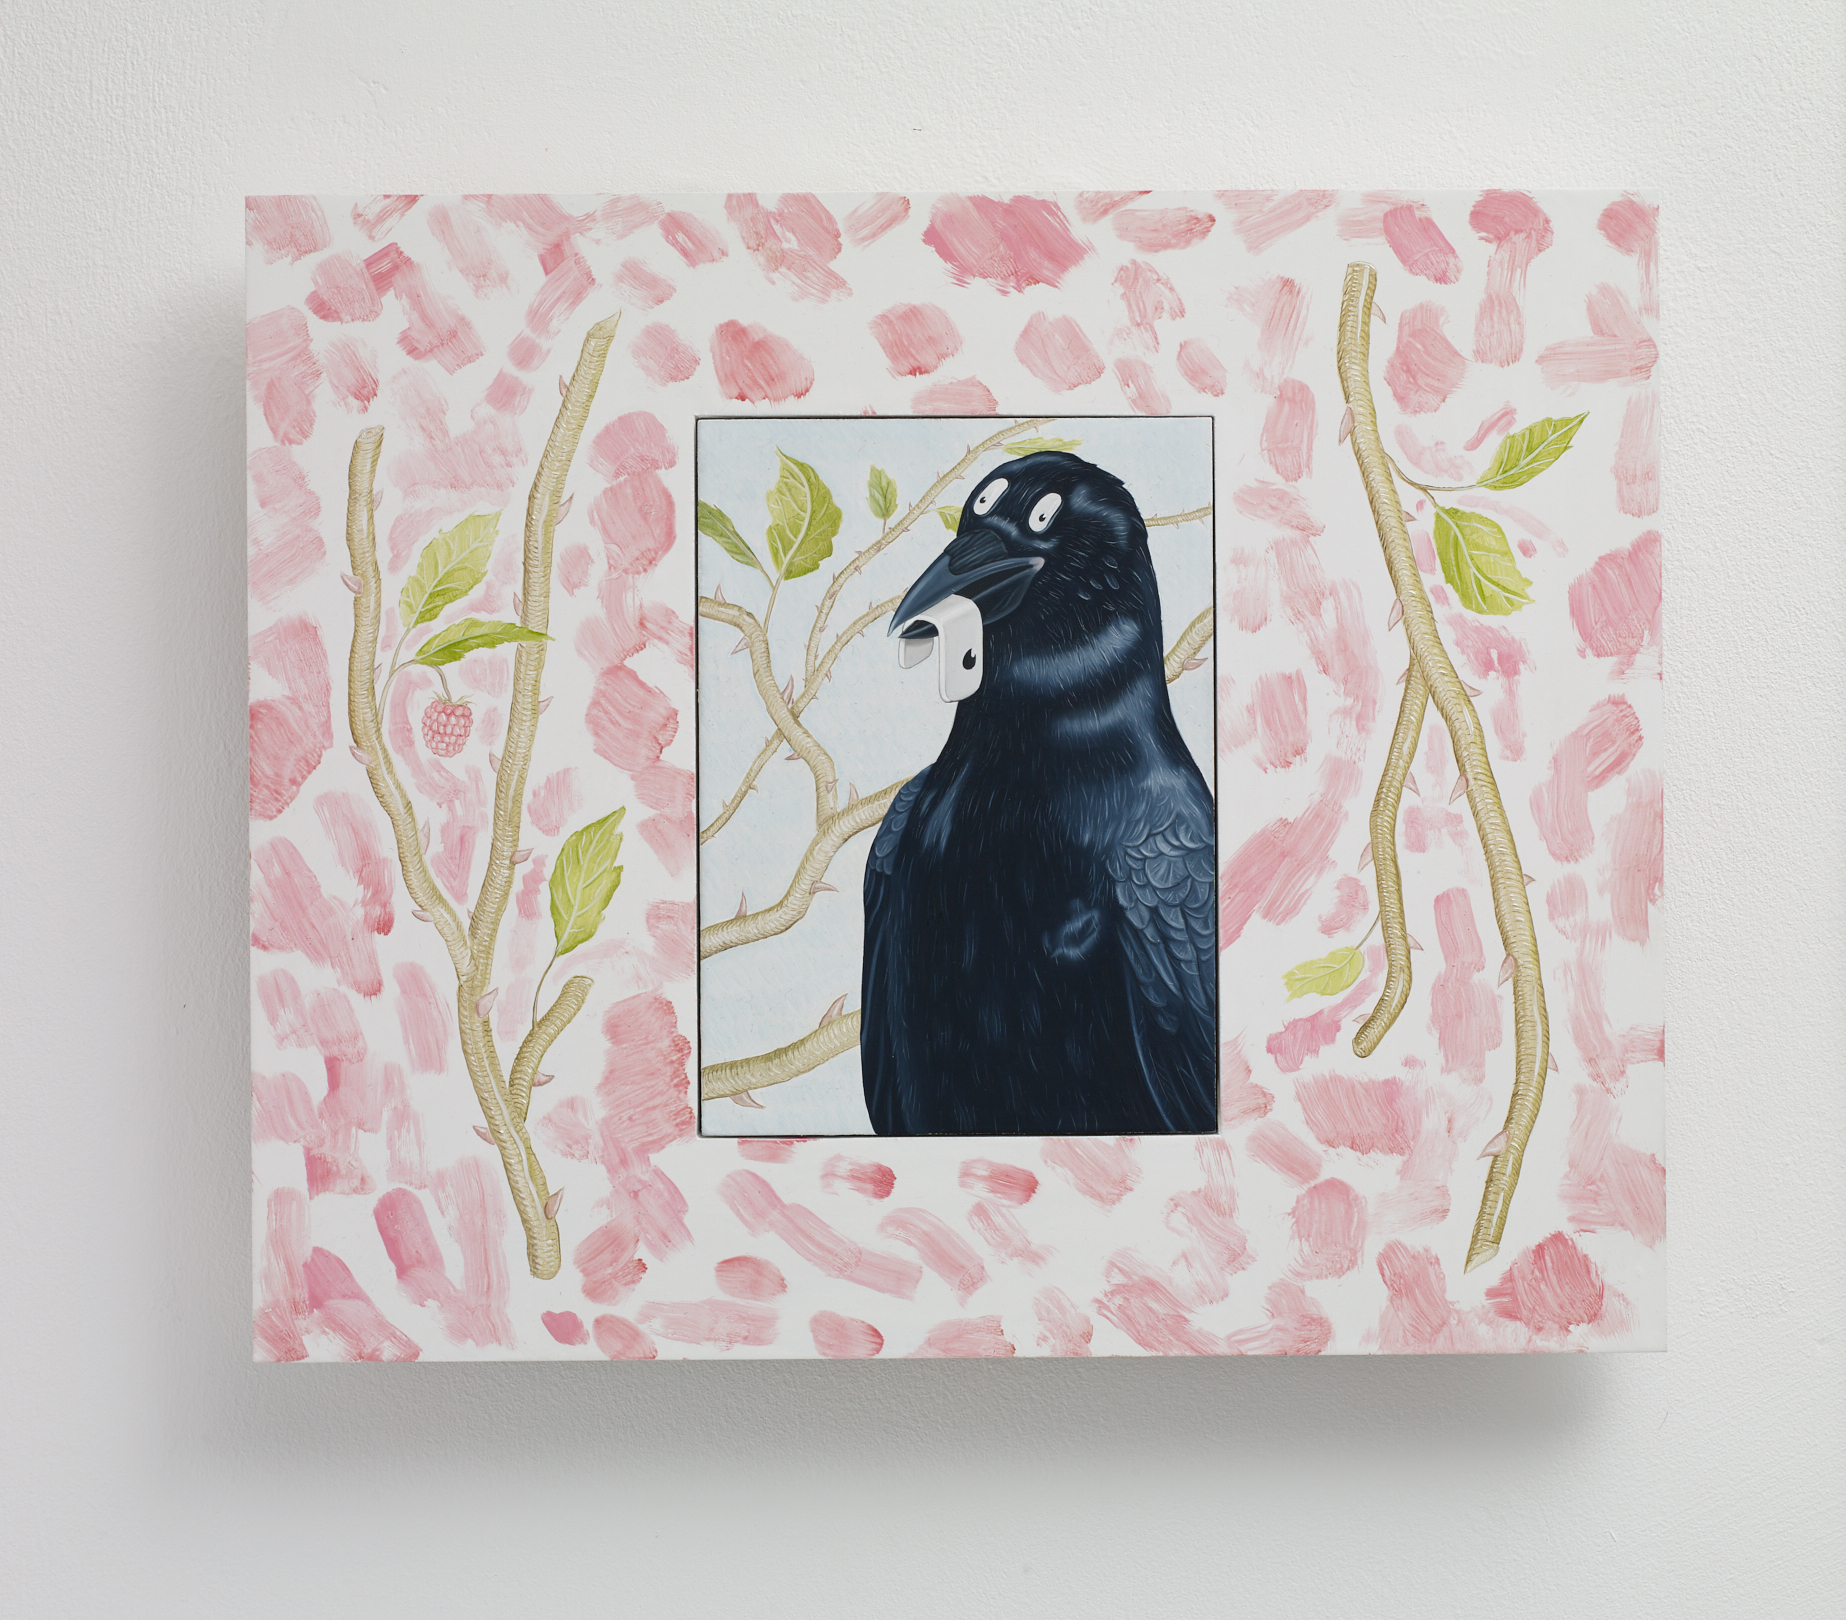 Tristan Pigott  Crow with Eye,  2019 Oil on board 31.5 x 26 cm framed 16 x 11.5 unframed